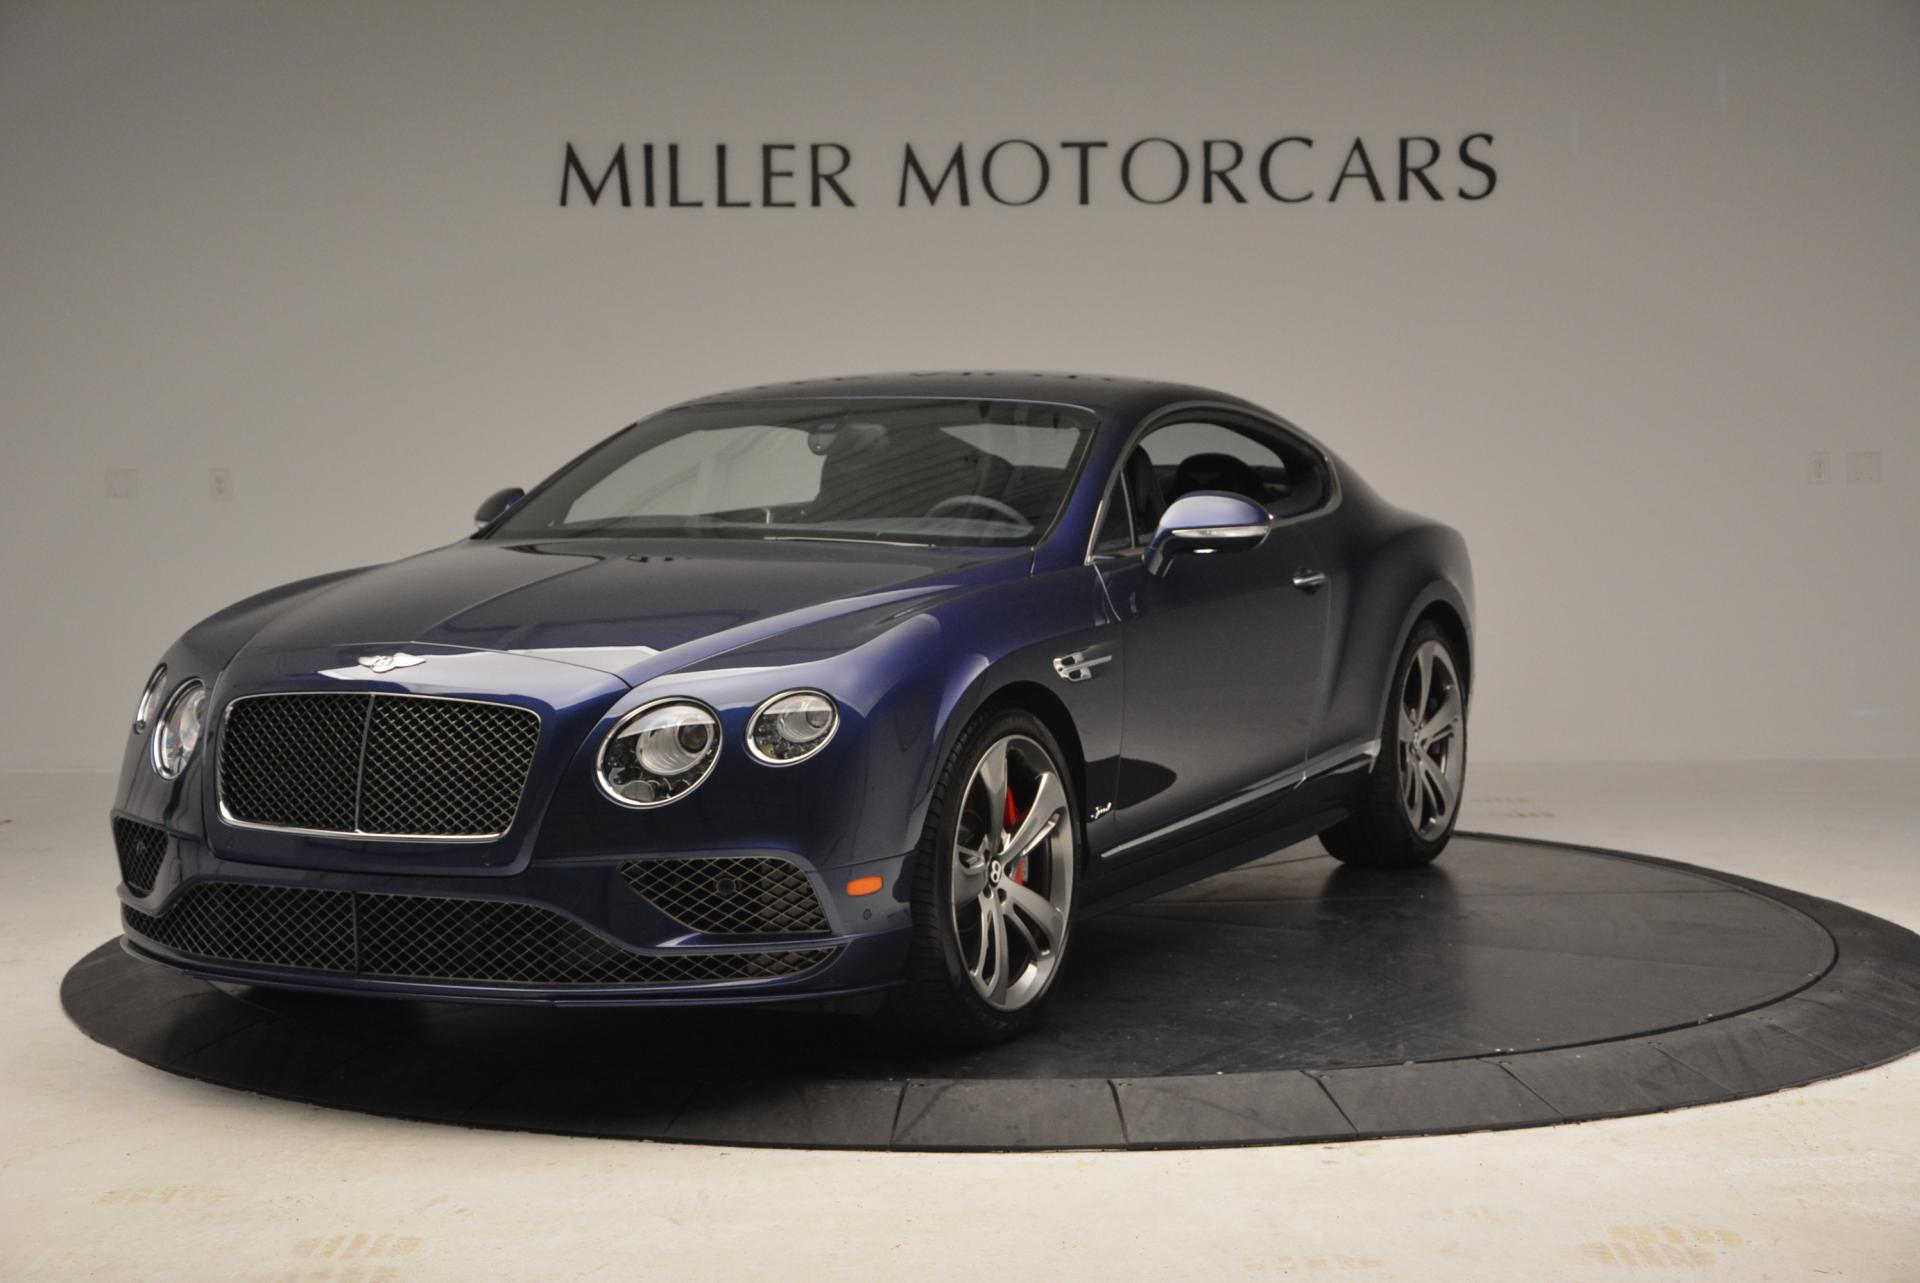 Used 2016 Bentley Continental GT Speed GT Speed for sale Sold at Alfa Romeo of Westport in Westport CT 06880 1